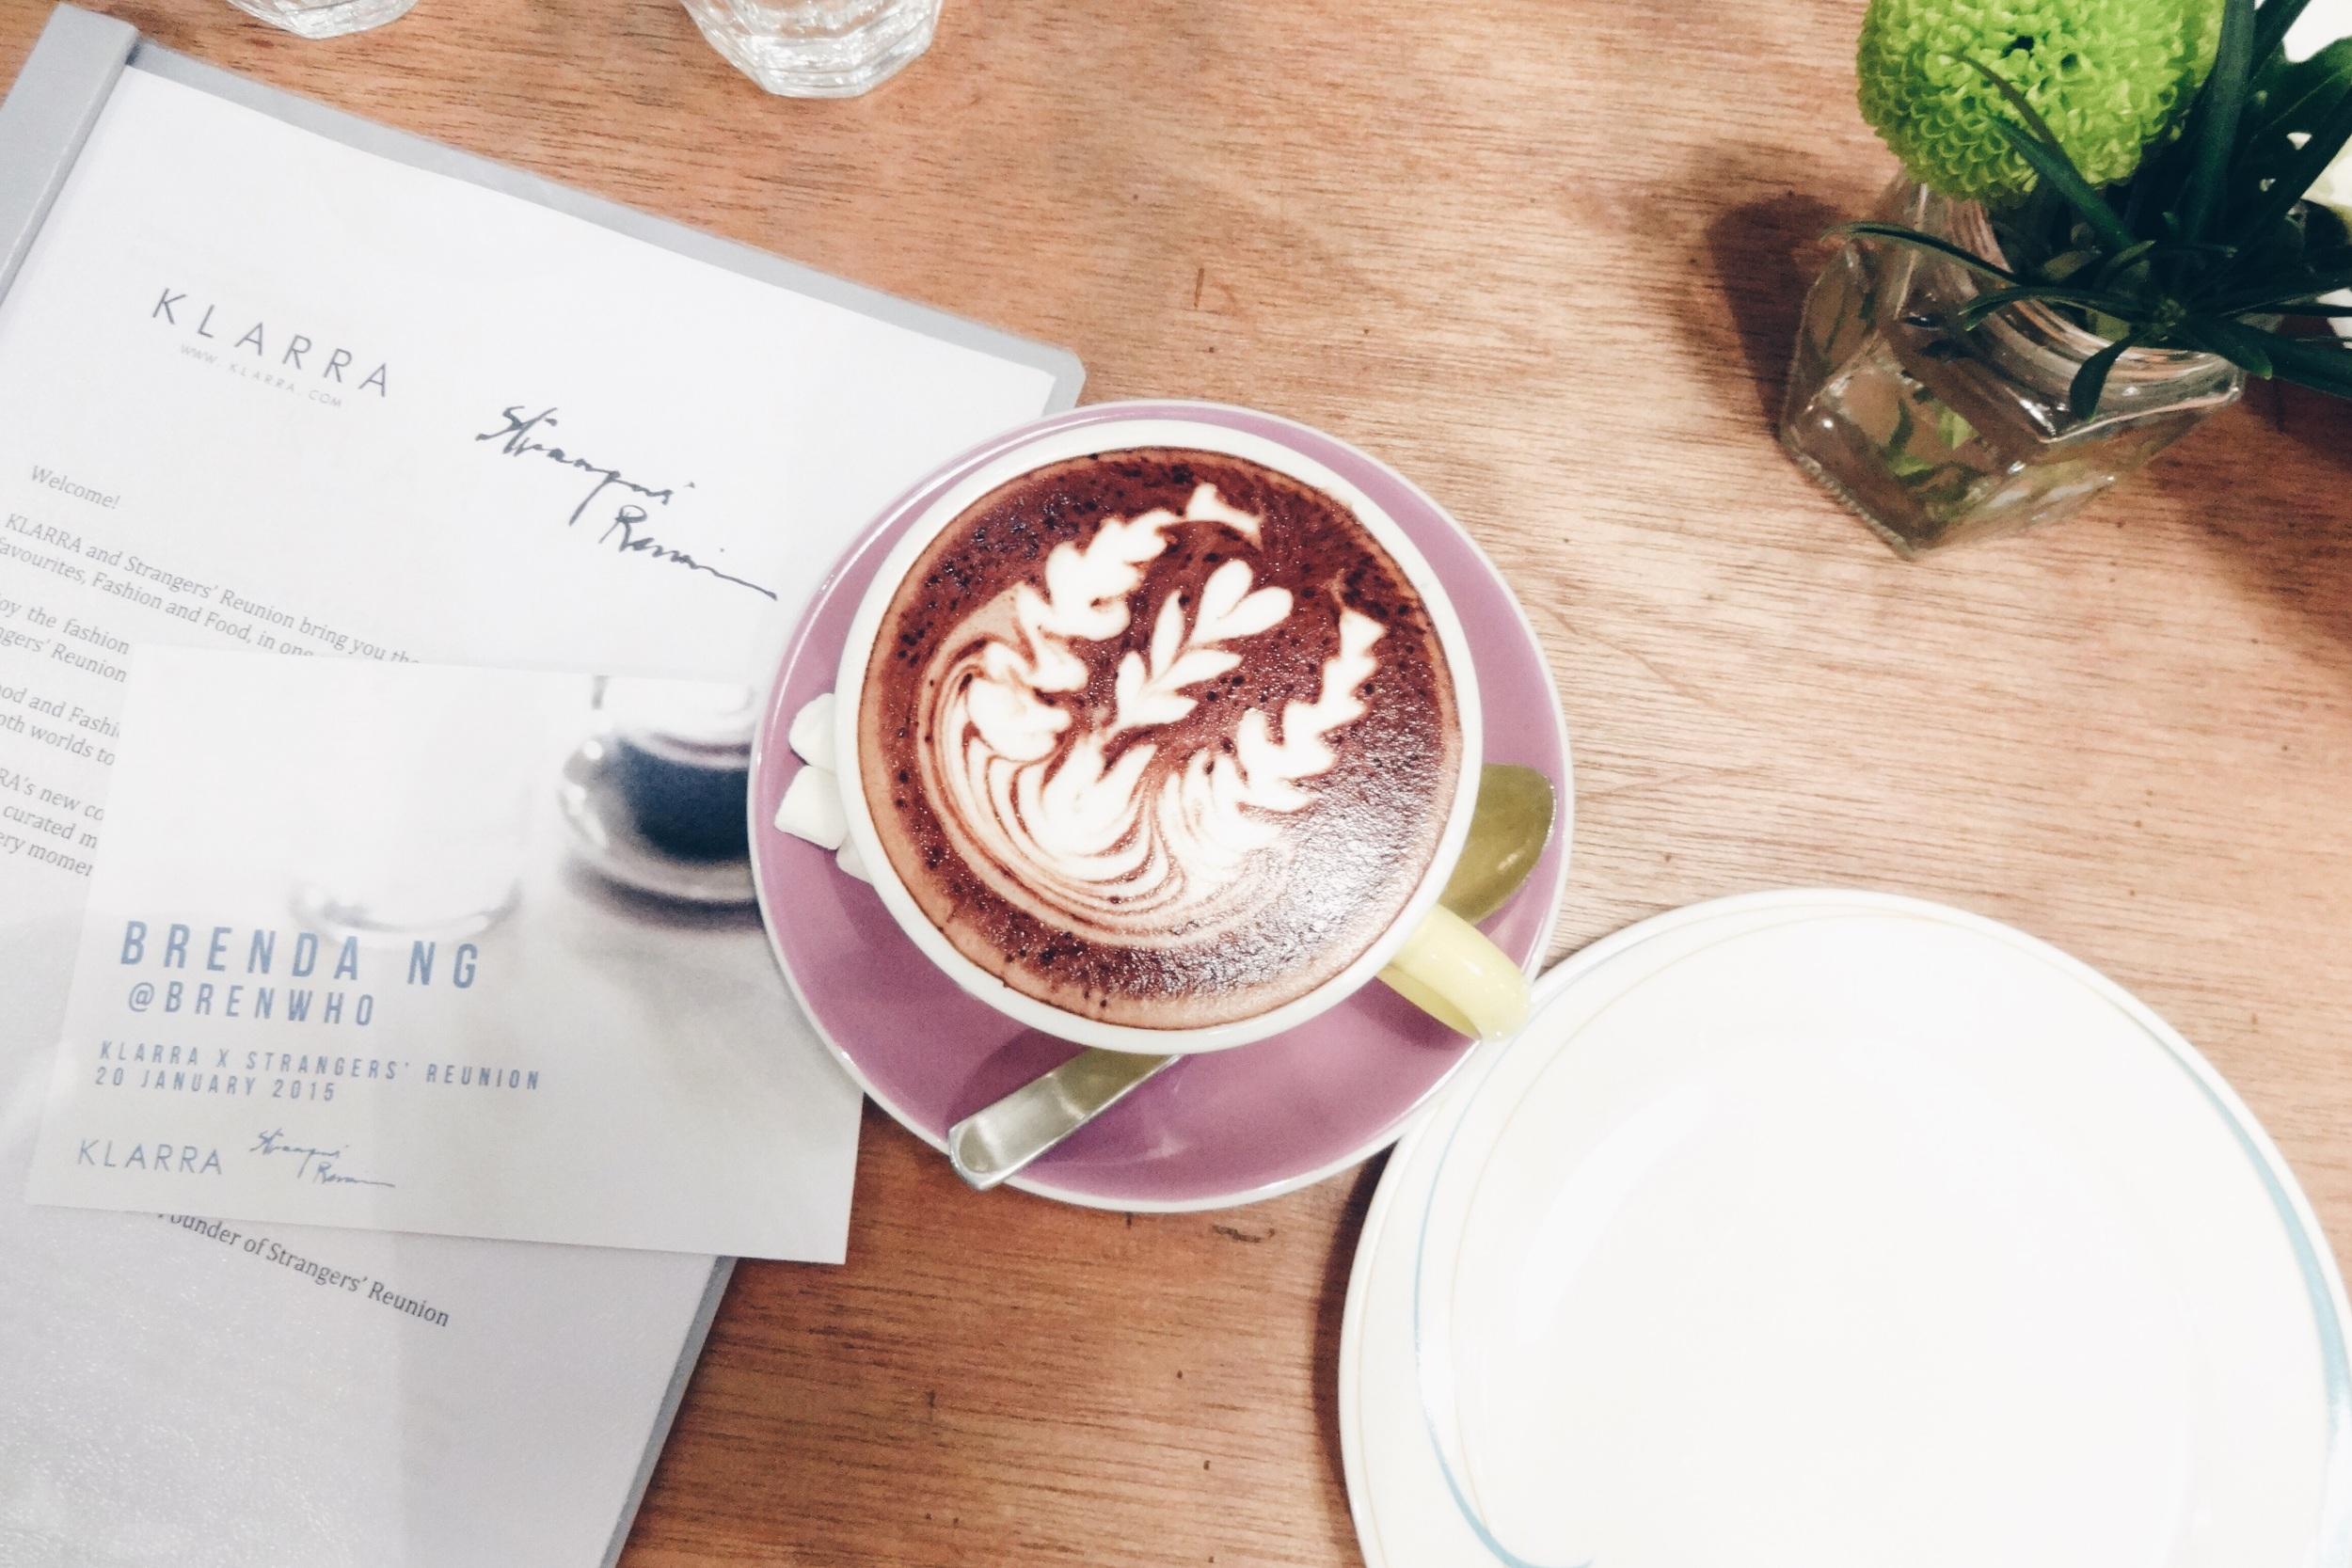 Strangers' Reunion – Hot chocolate